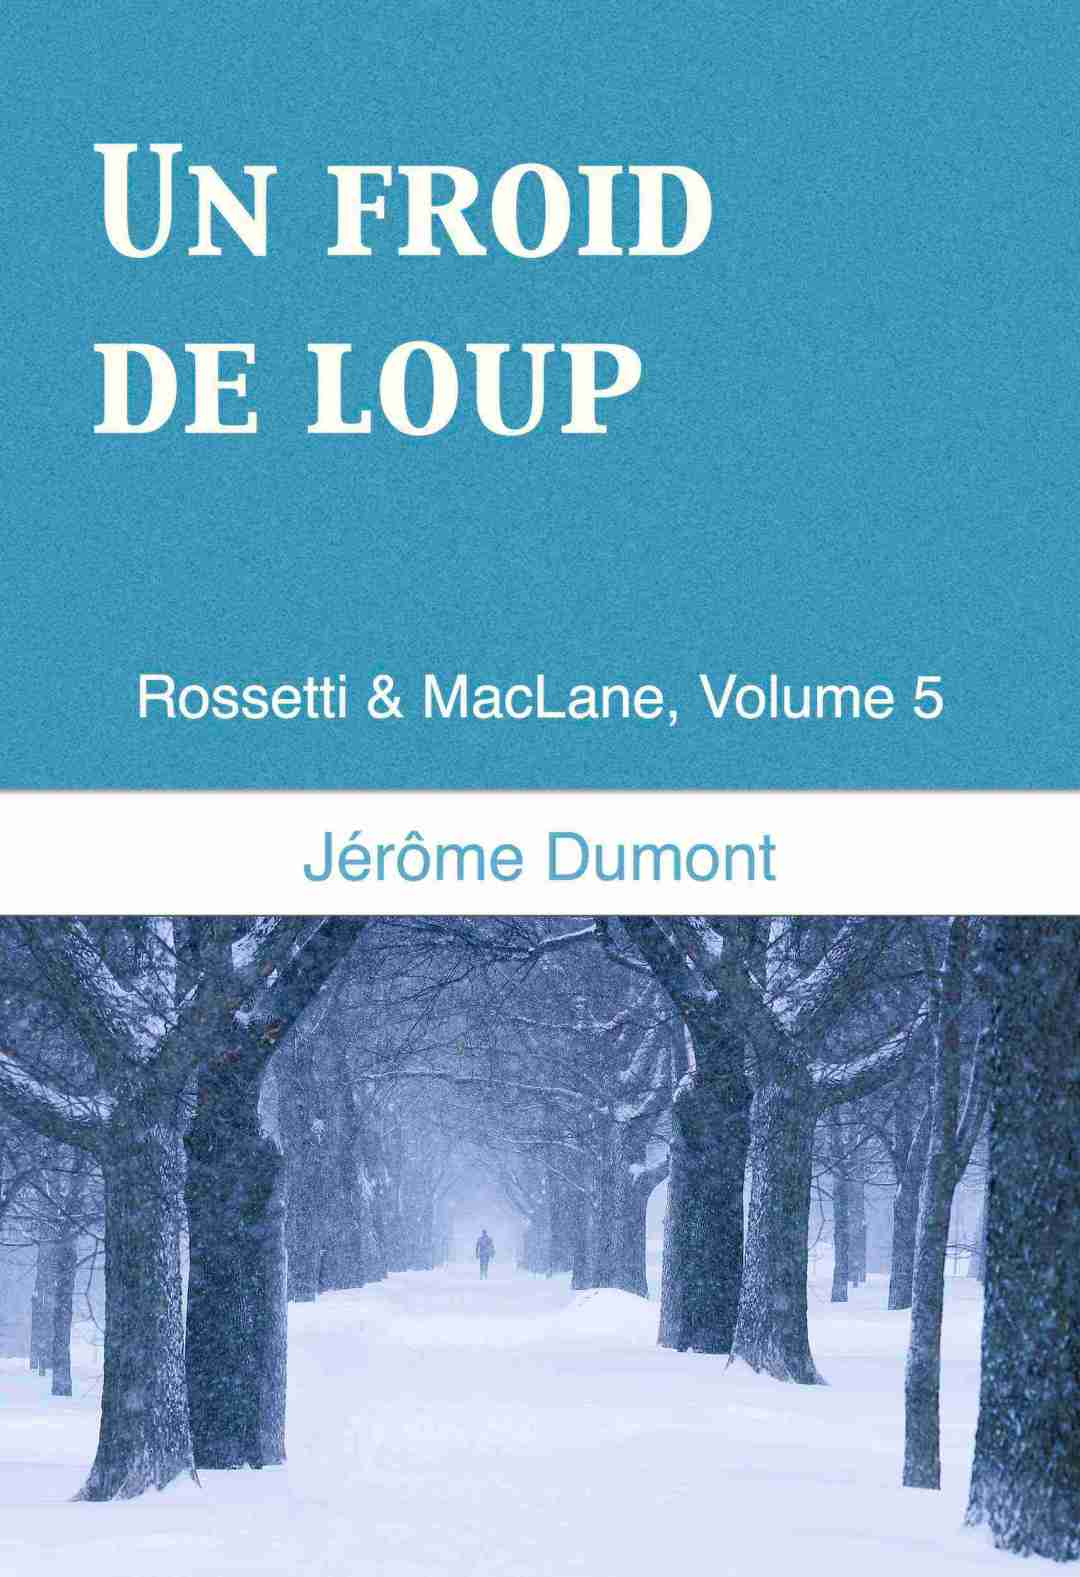 un-froid-de-loup-rossetti-maclane-5